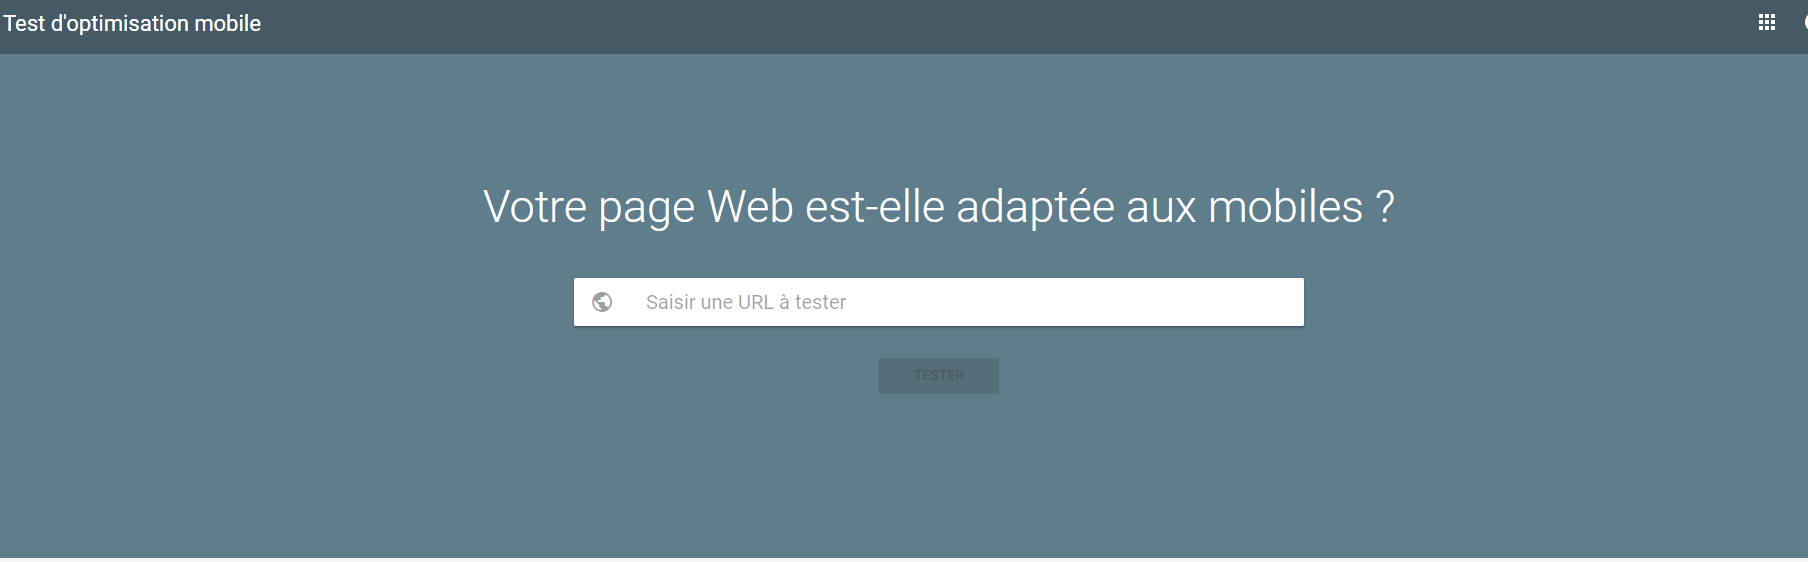 Agence web Protai-in - test google